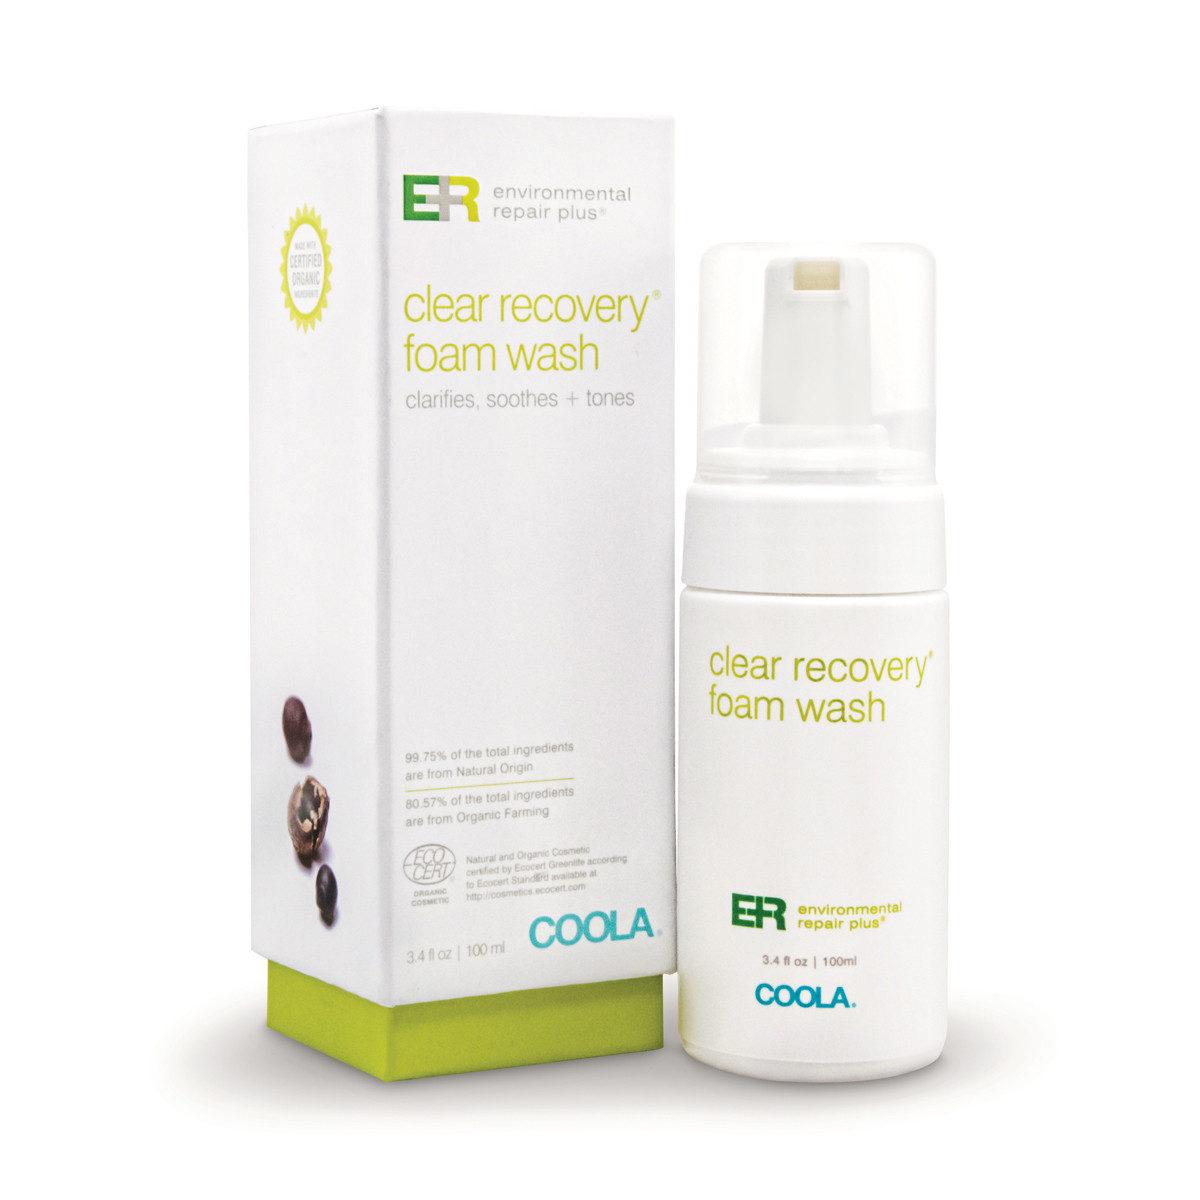 COOLA Environmental Repair Plus Clear Recovery Foam Wash